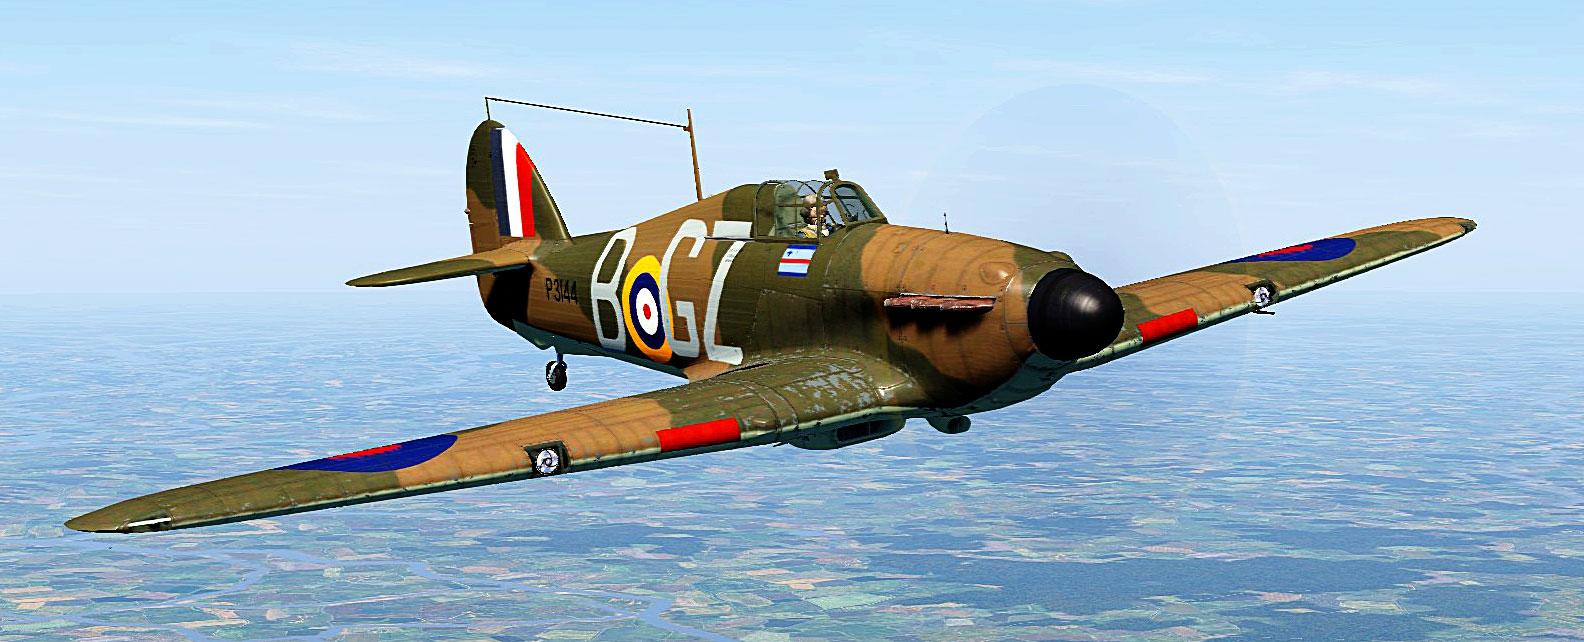 COD C6 Hurricane I RAF 32Sqn GZ B John Worrall P31442 guarding England July 1940 V01